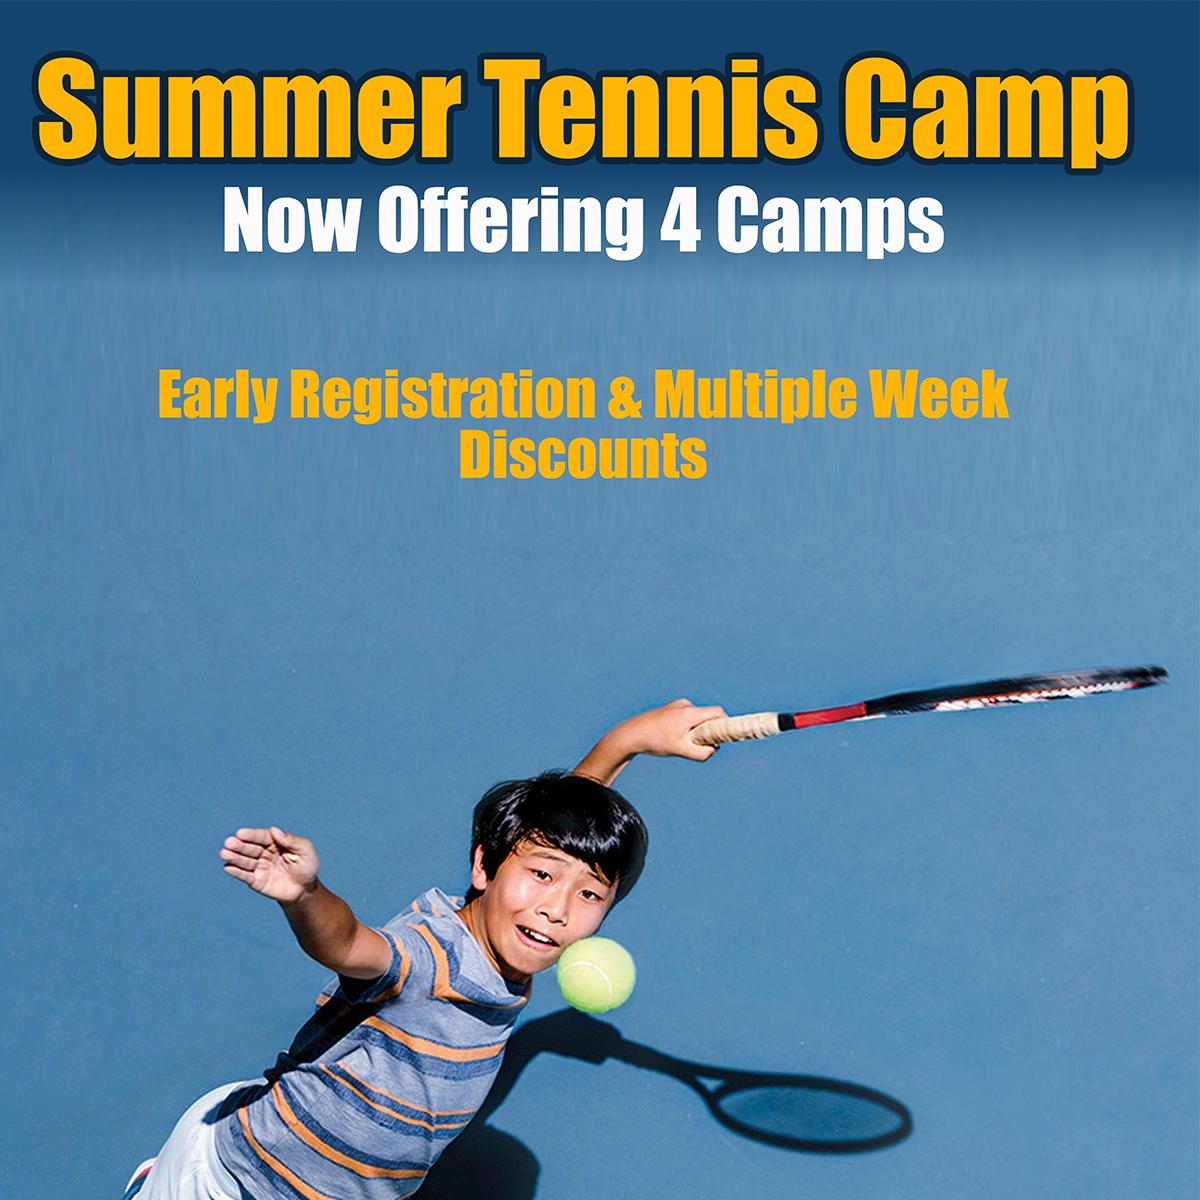 Summer Camp, Tennis lessons, tennis instruction, kids tennis,